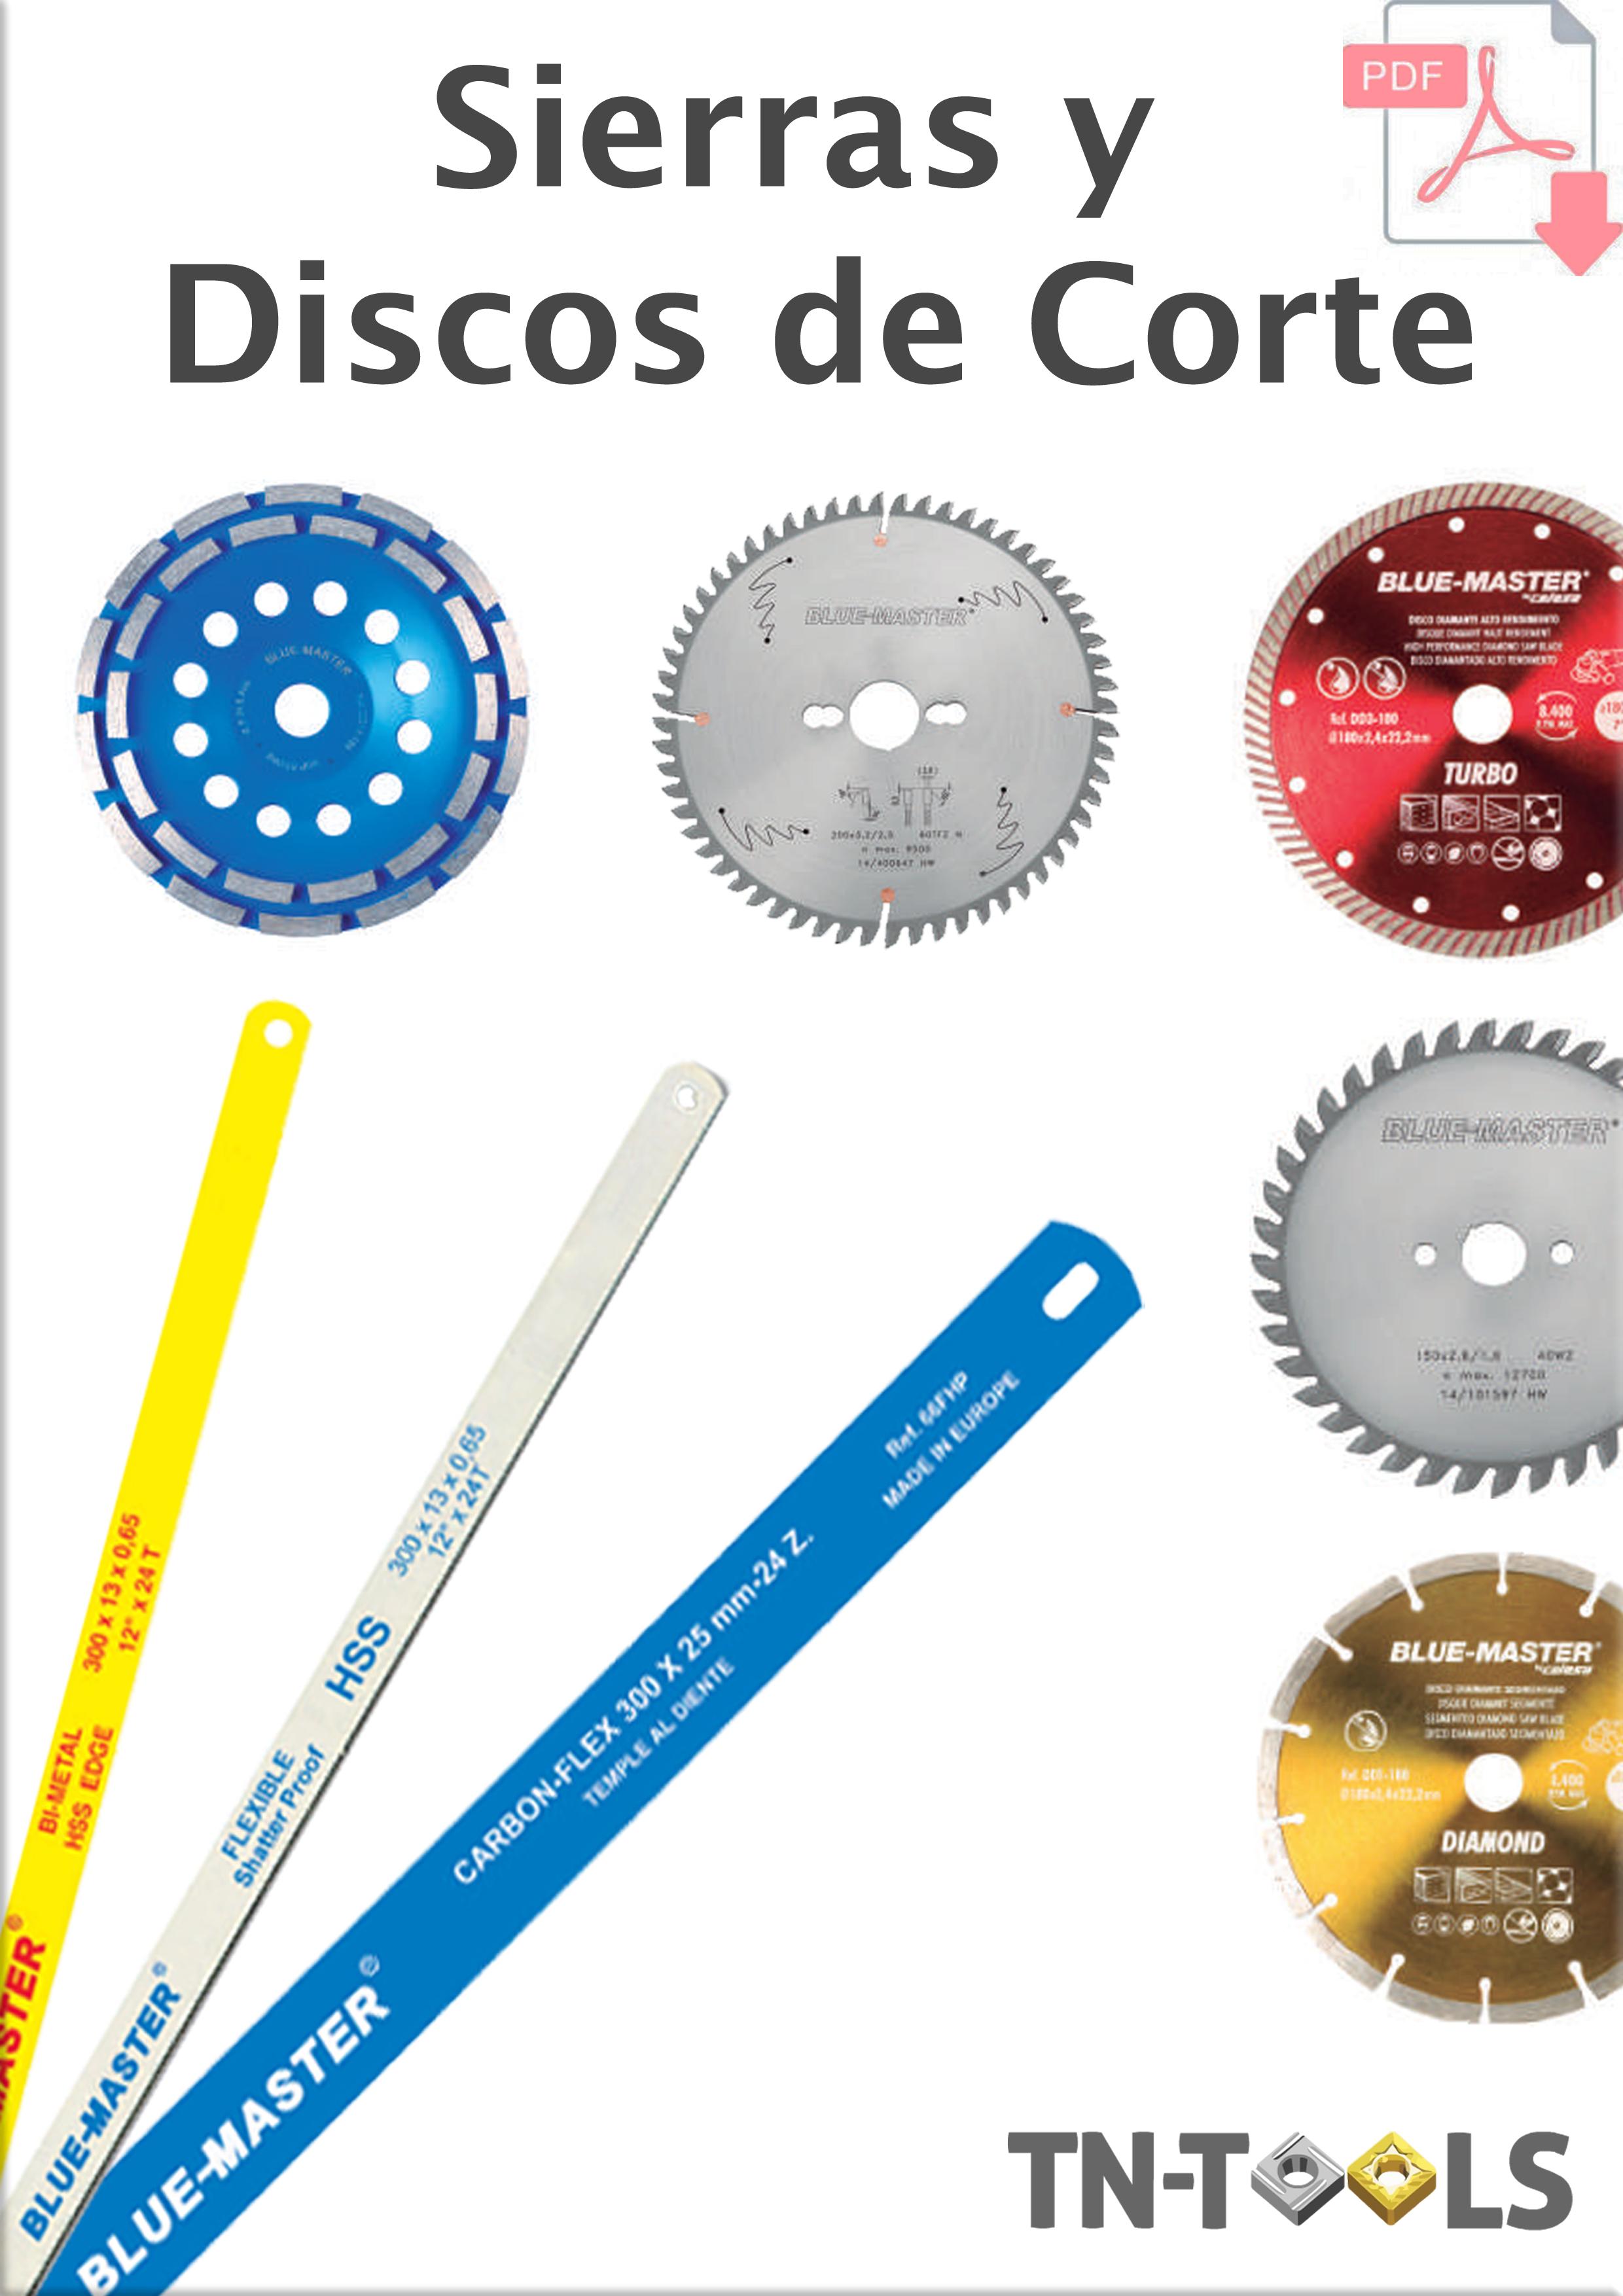 Catálogo de Sierras/Discos con Precios